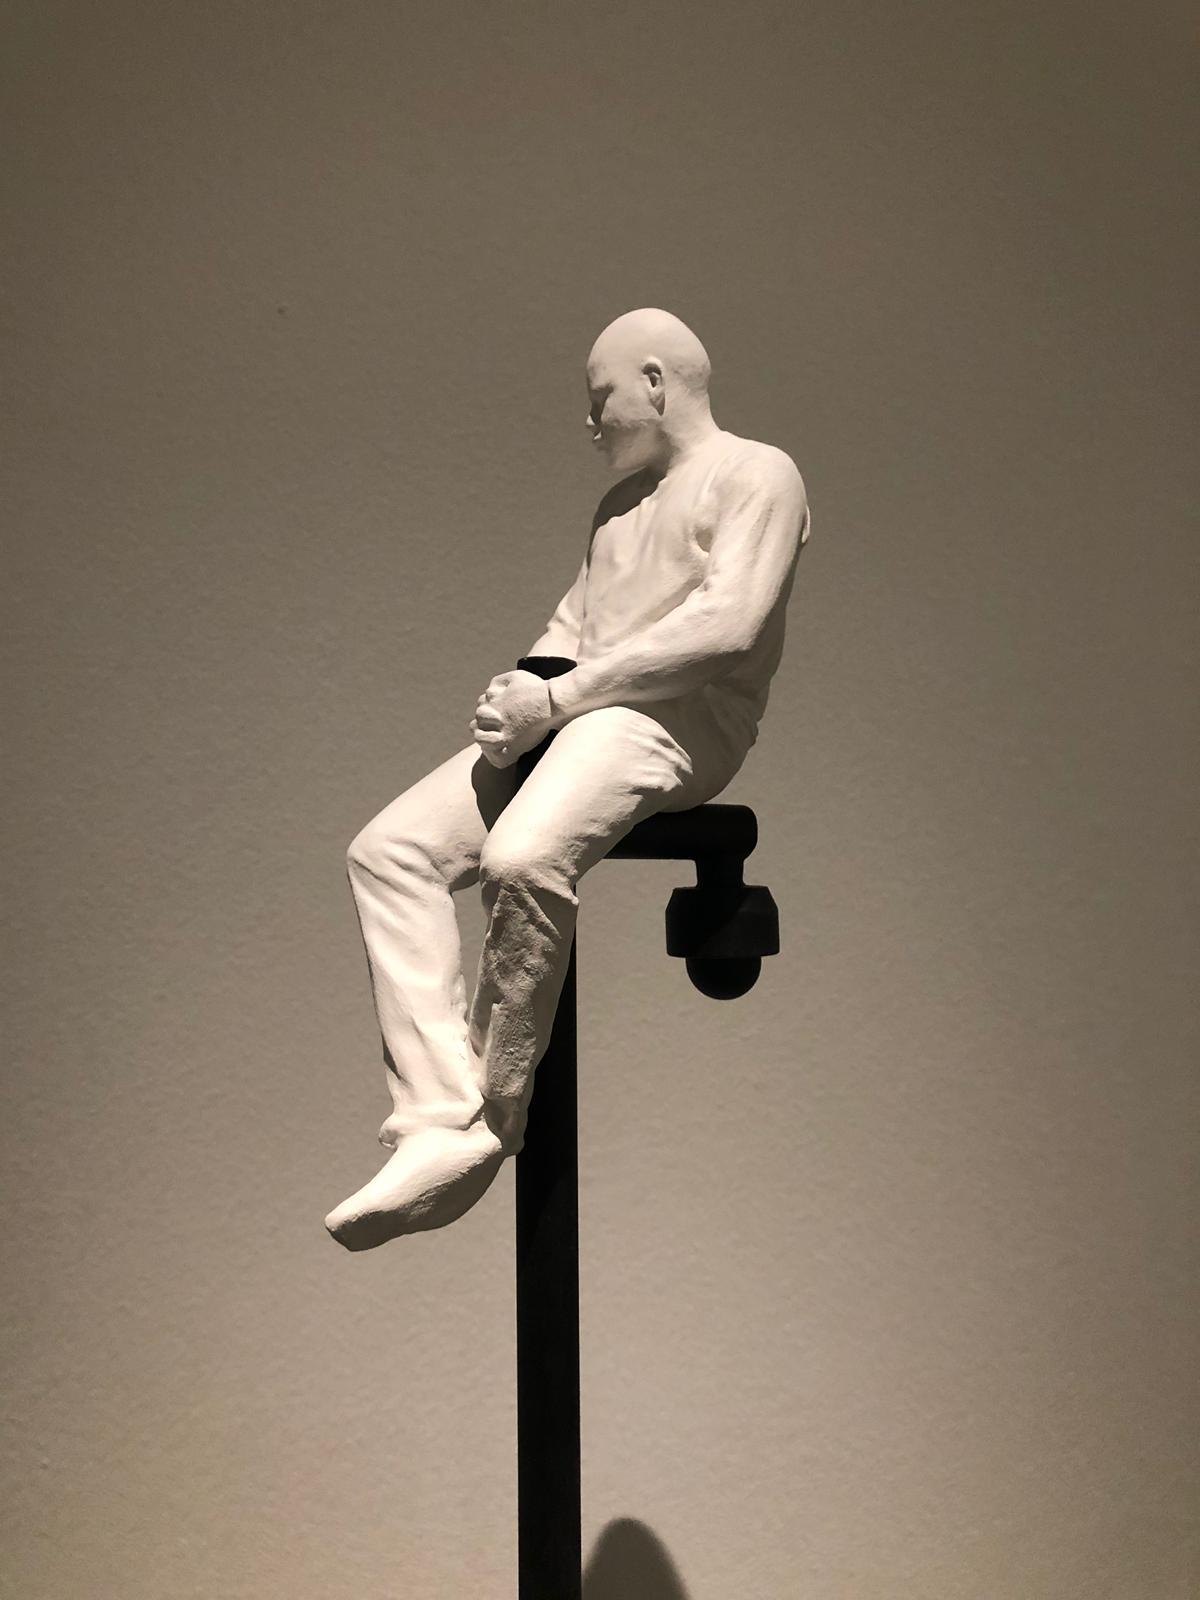 obra de Fernando Sánchez, escultor